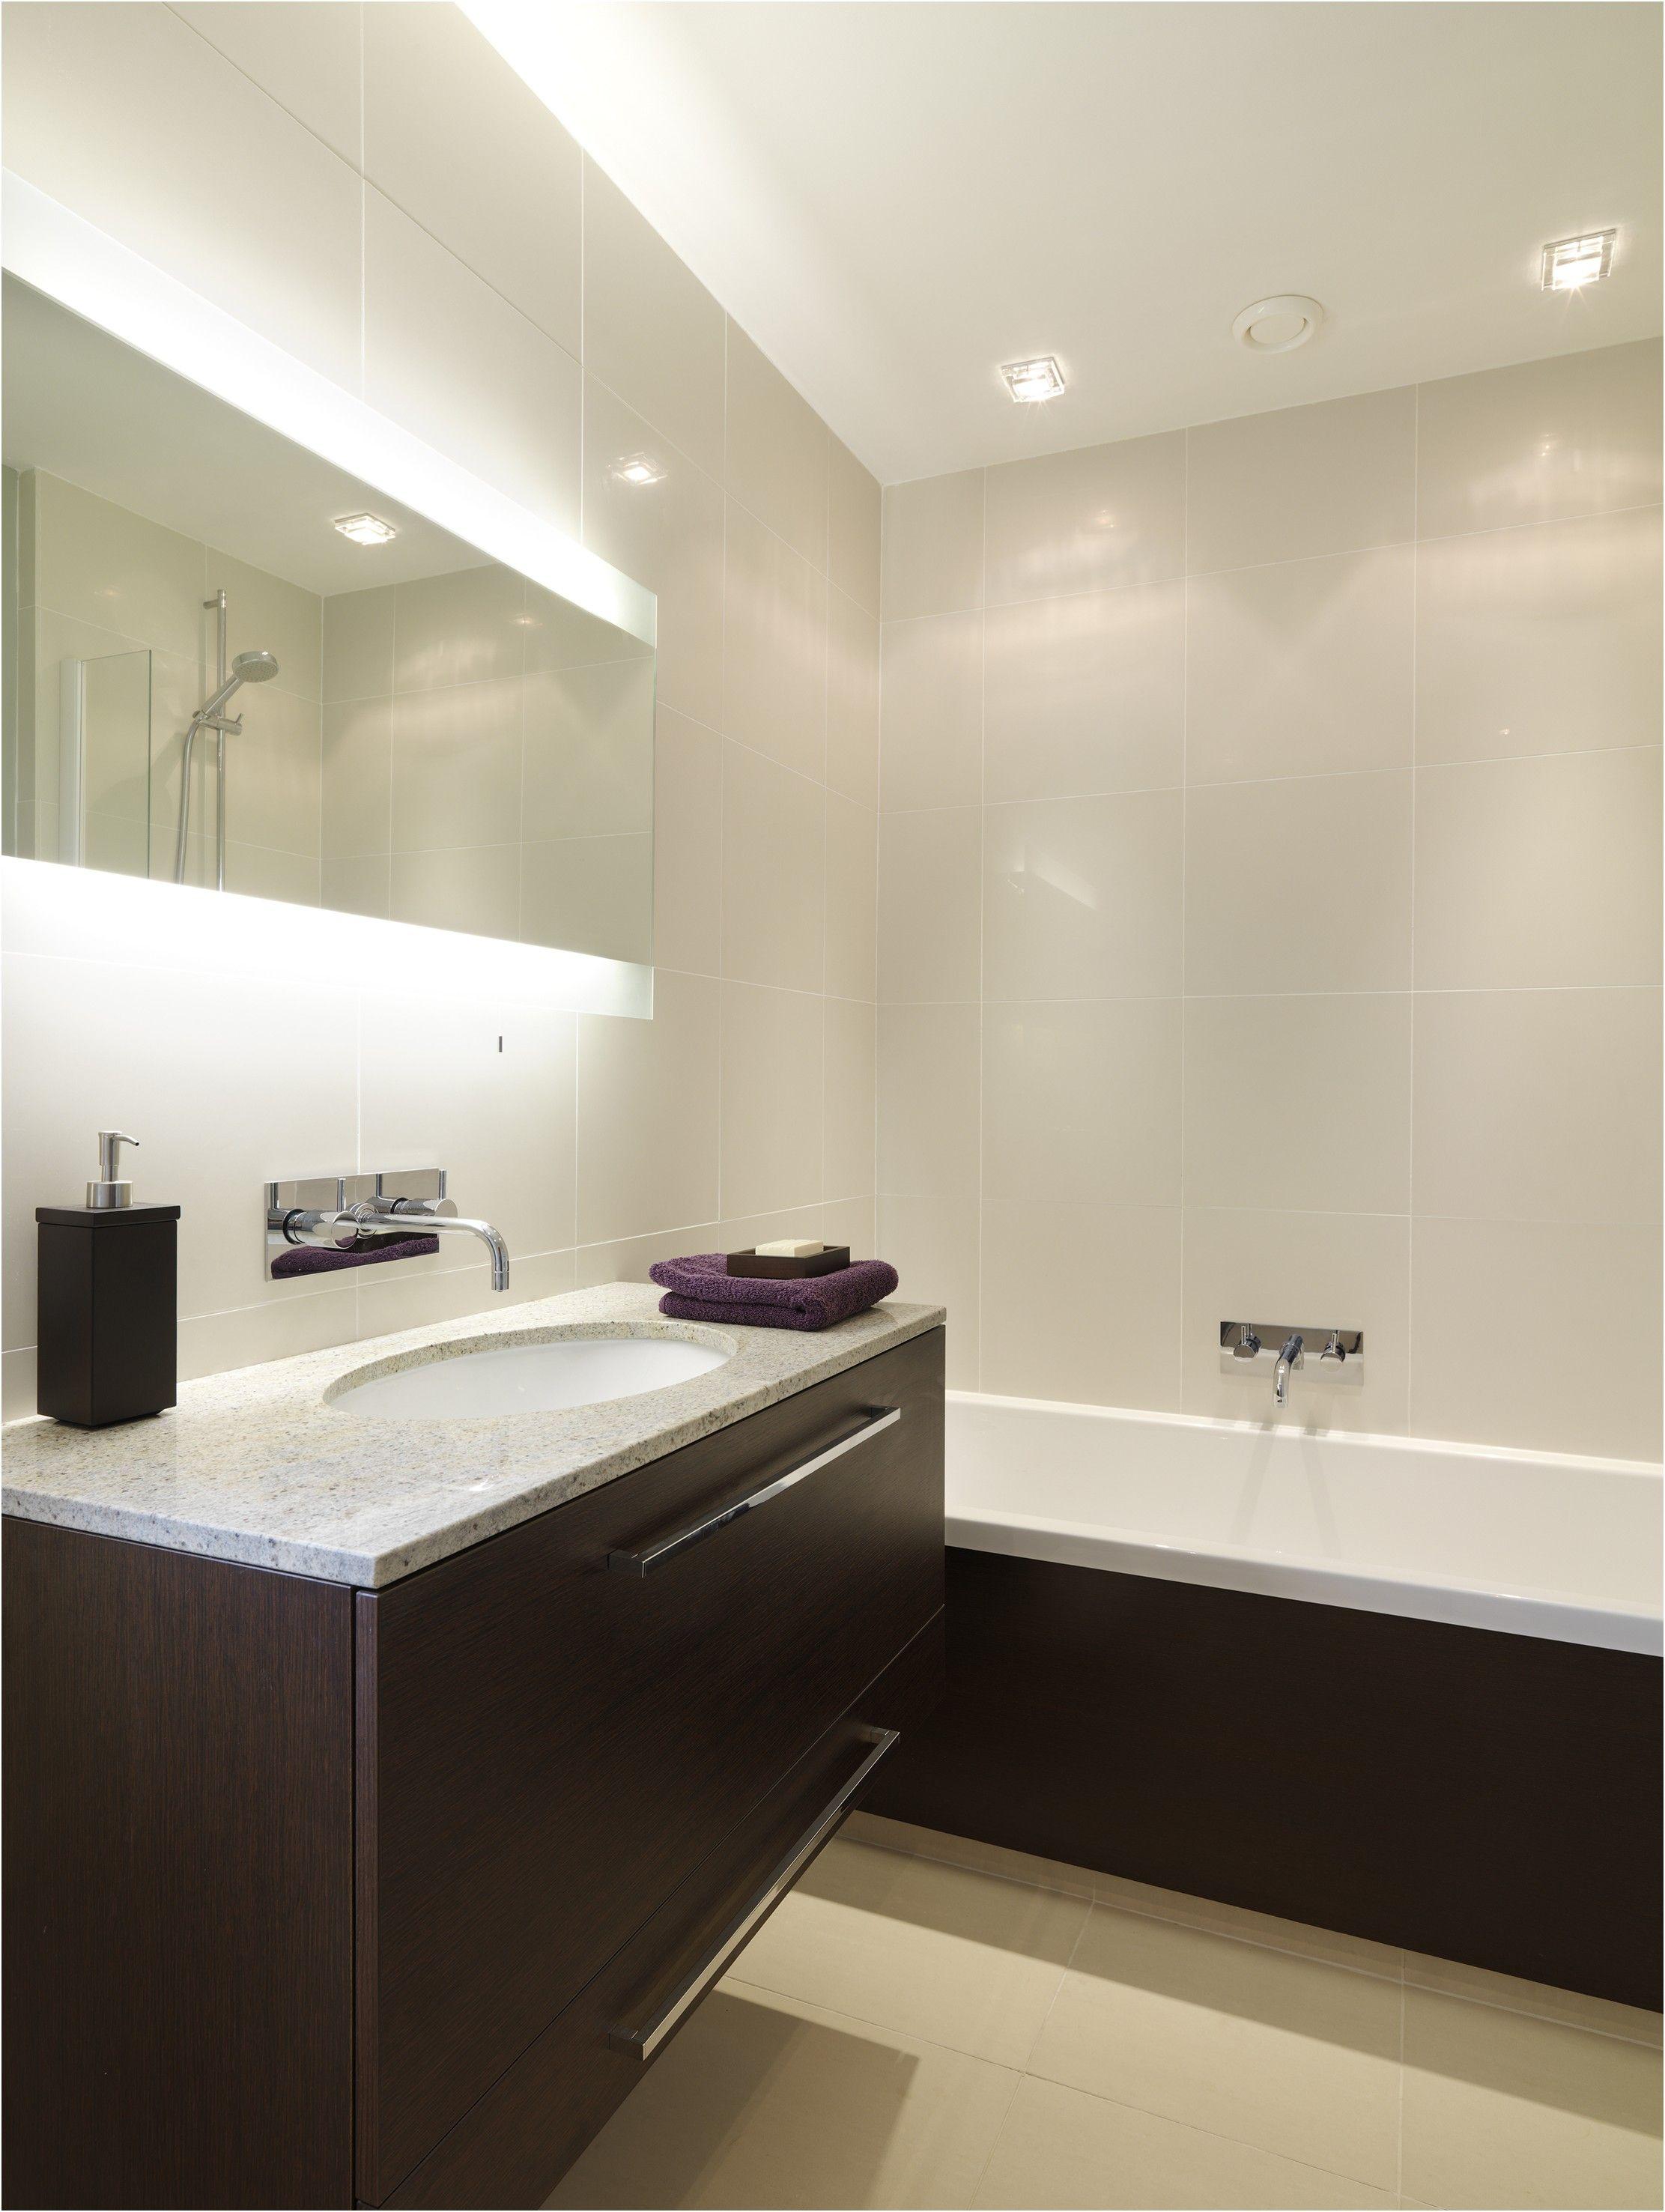 Bathroom bathroom lighting spotlights from bathroom lighting